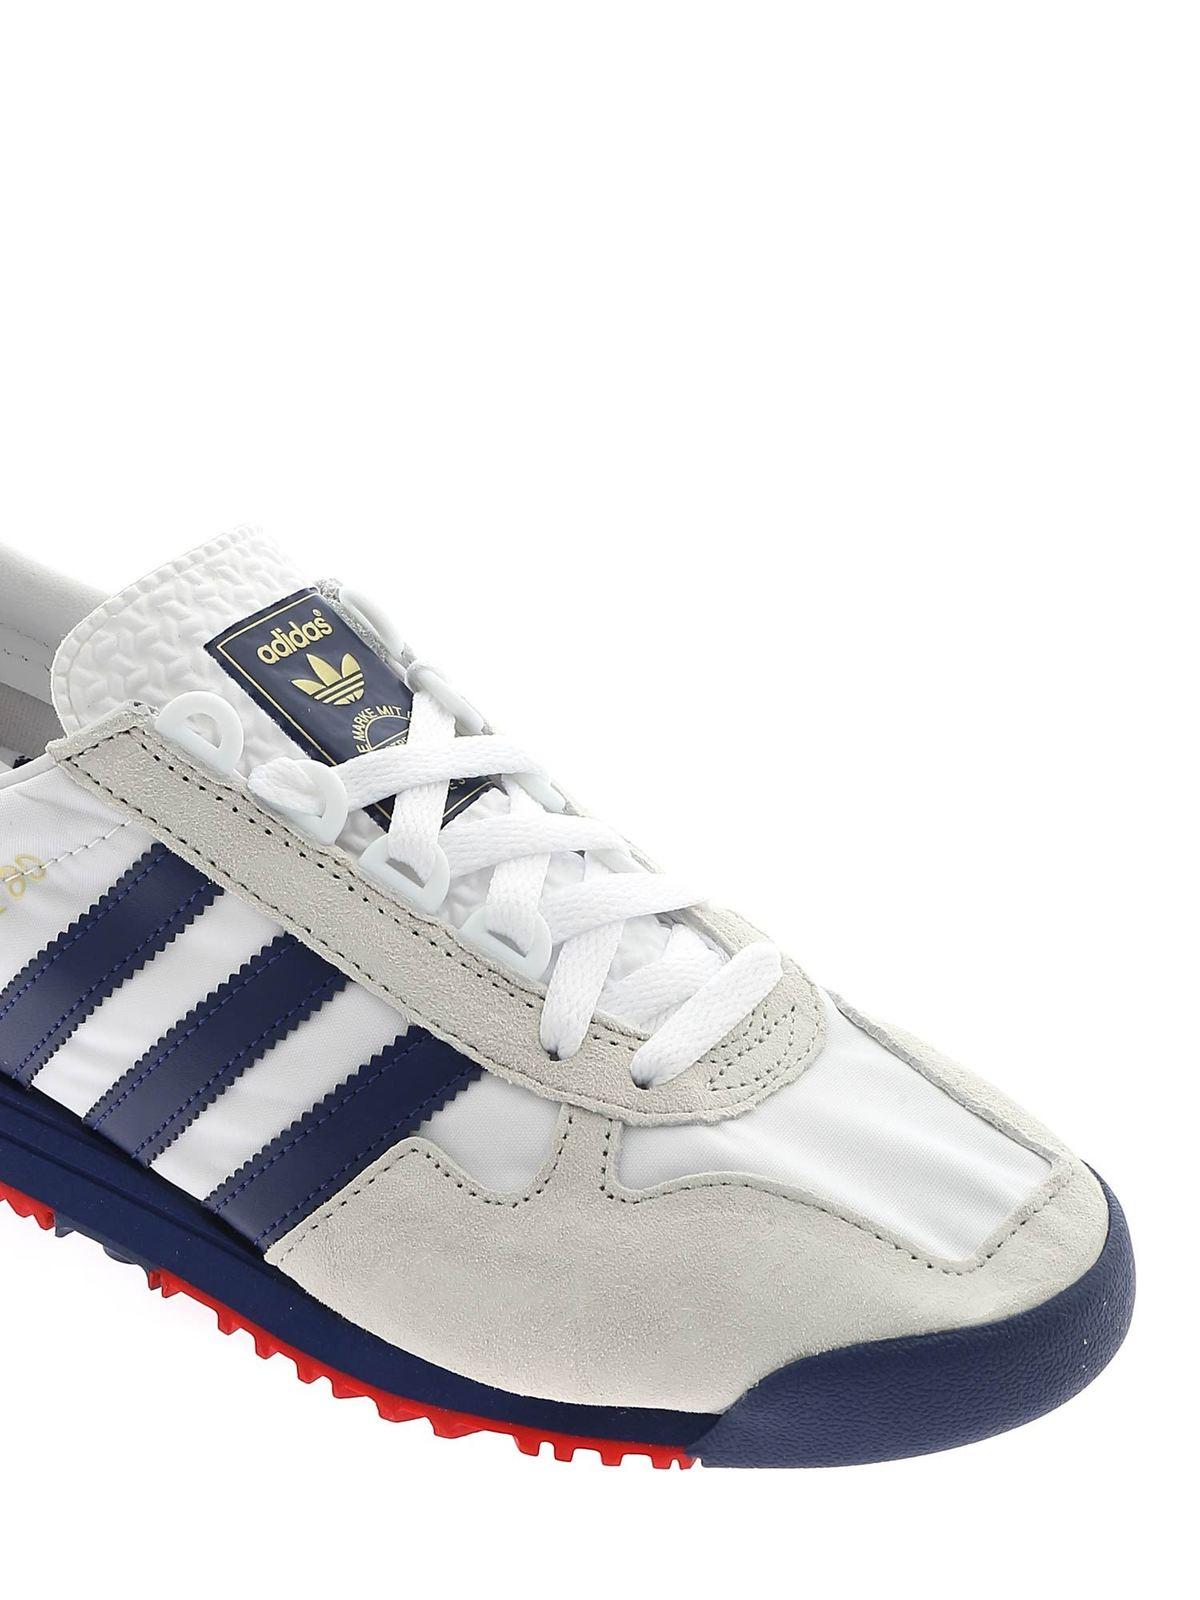 Adidas Originals - Sl 80 sneakers in